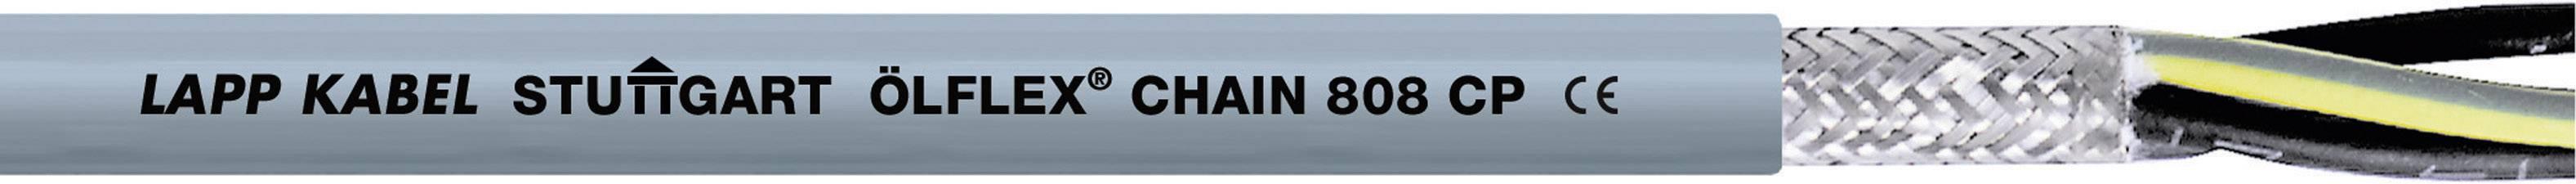 Žíla kabelu LappKabel ÖLFLEX CHAIN 808 CP 3G2,5 (1027783), 3x 2,5 mm², polyurethan, Ø 9 mm, stíněný, 100 m, še